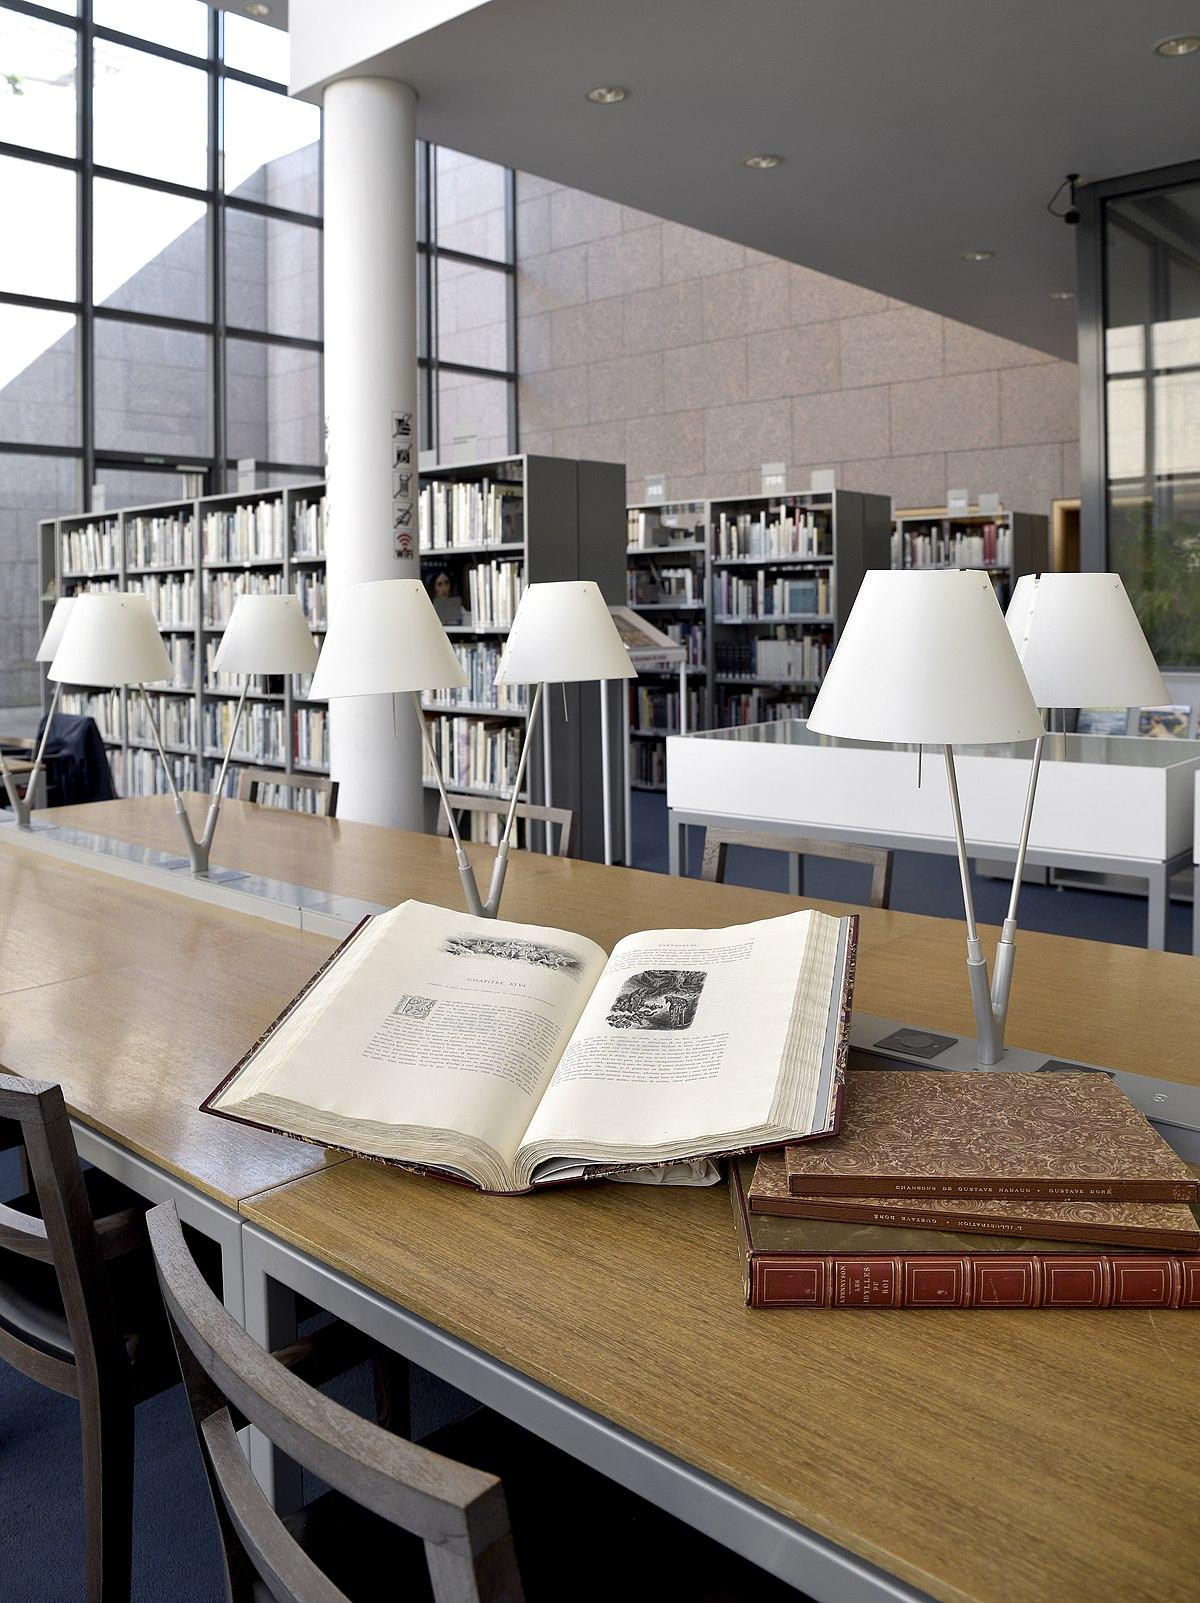 bibliotheque des musees de strasbourg